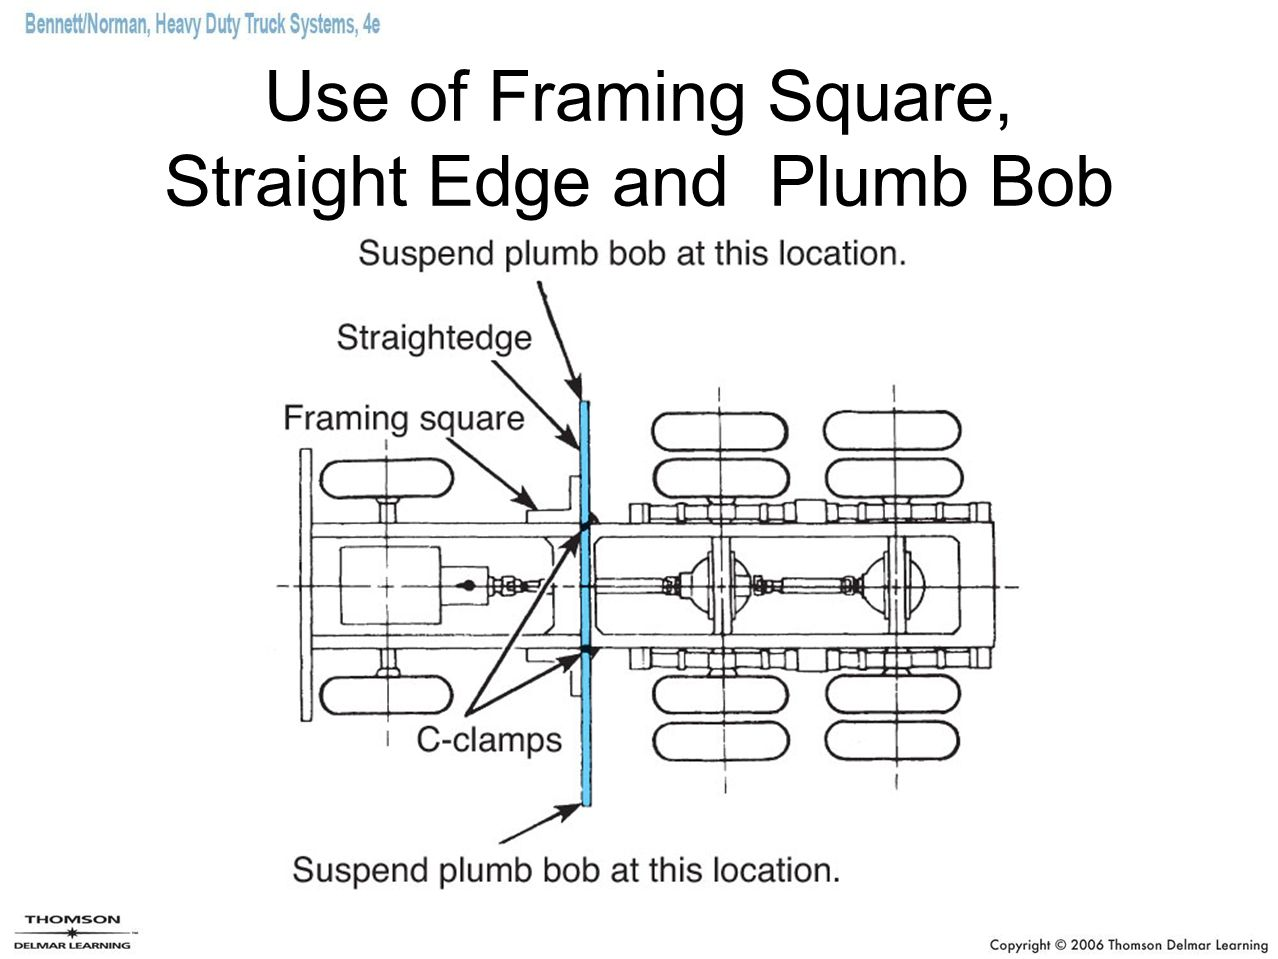 Use of Framing Square, Straight Edge and Plumb Bob